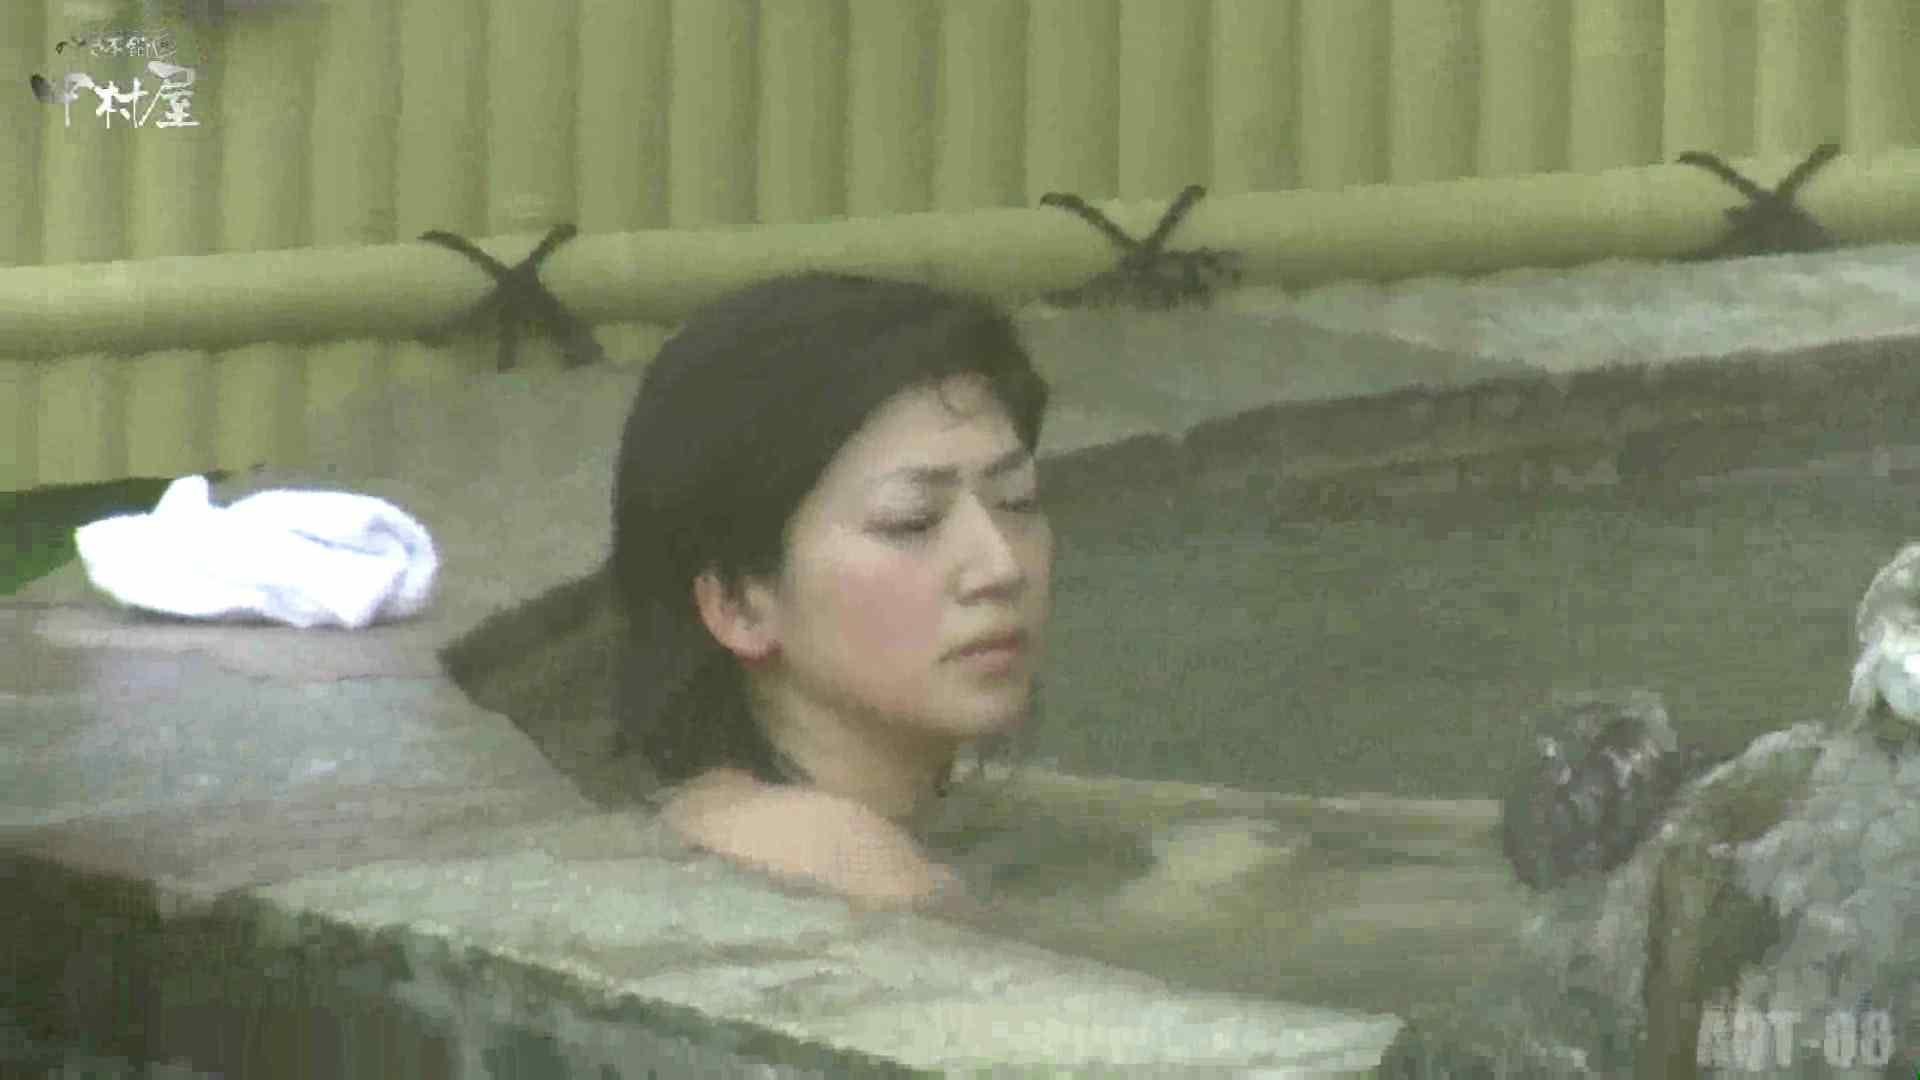 Aquaな露天風呂Vol.872潜入盗撮露天風呂八判湯 其の四 OL女体  92連発 88